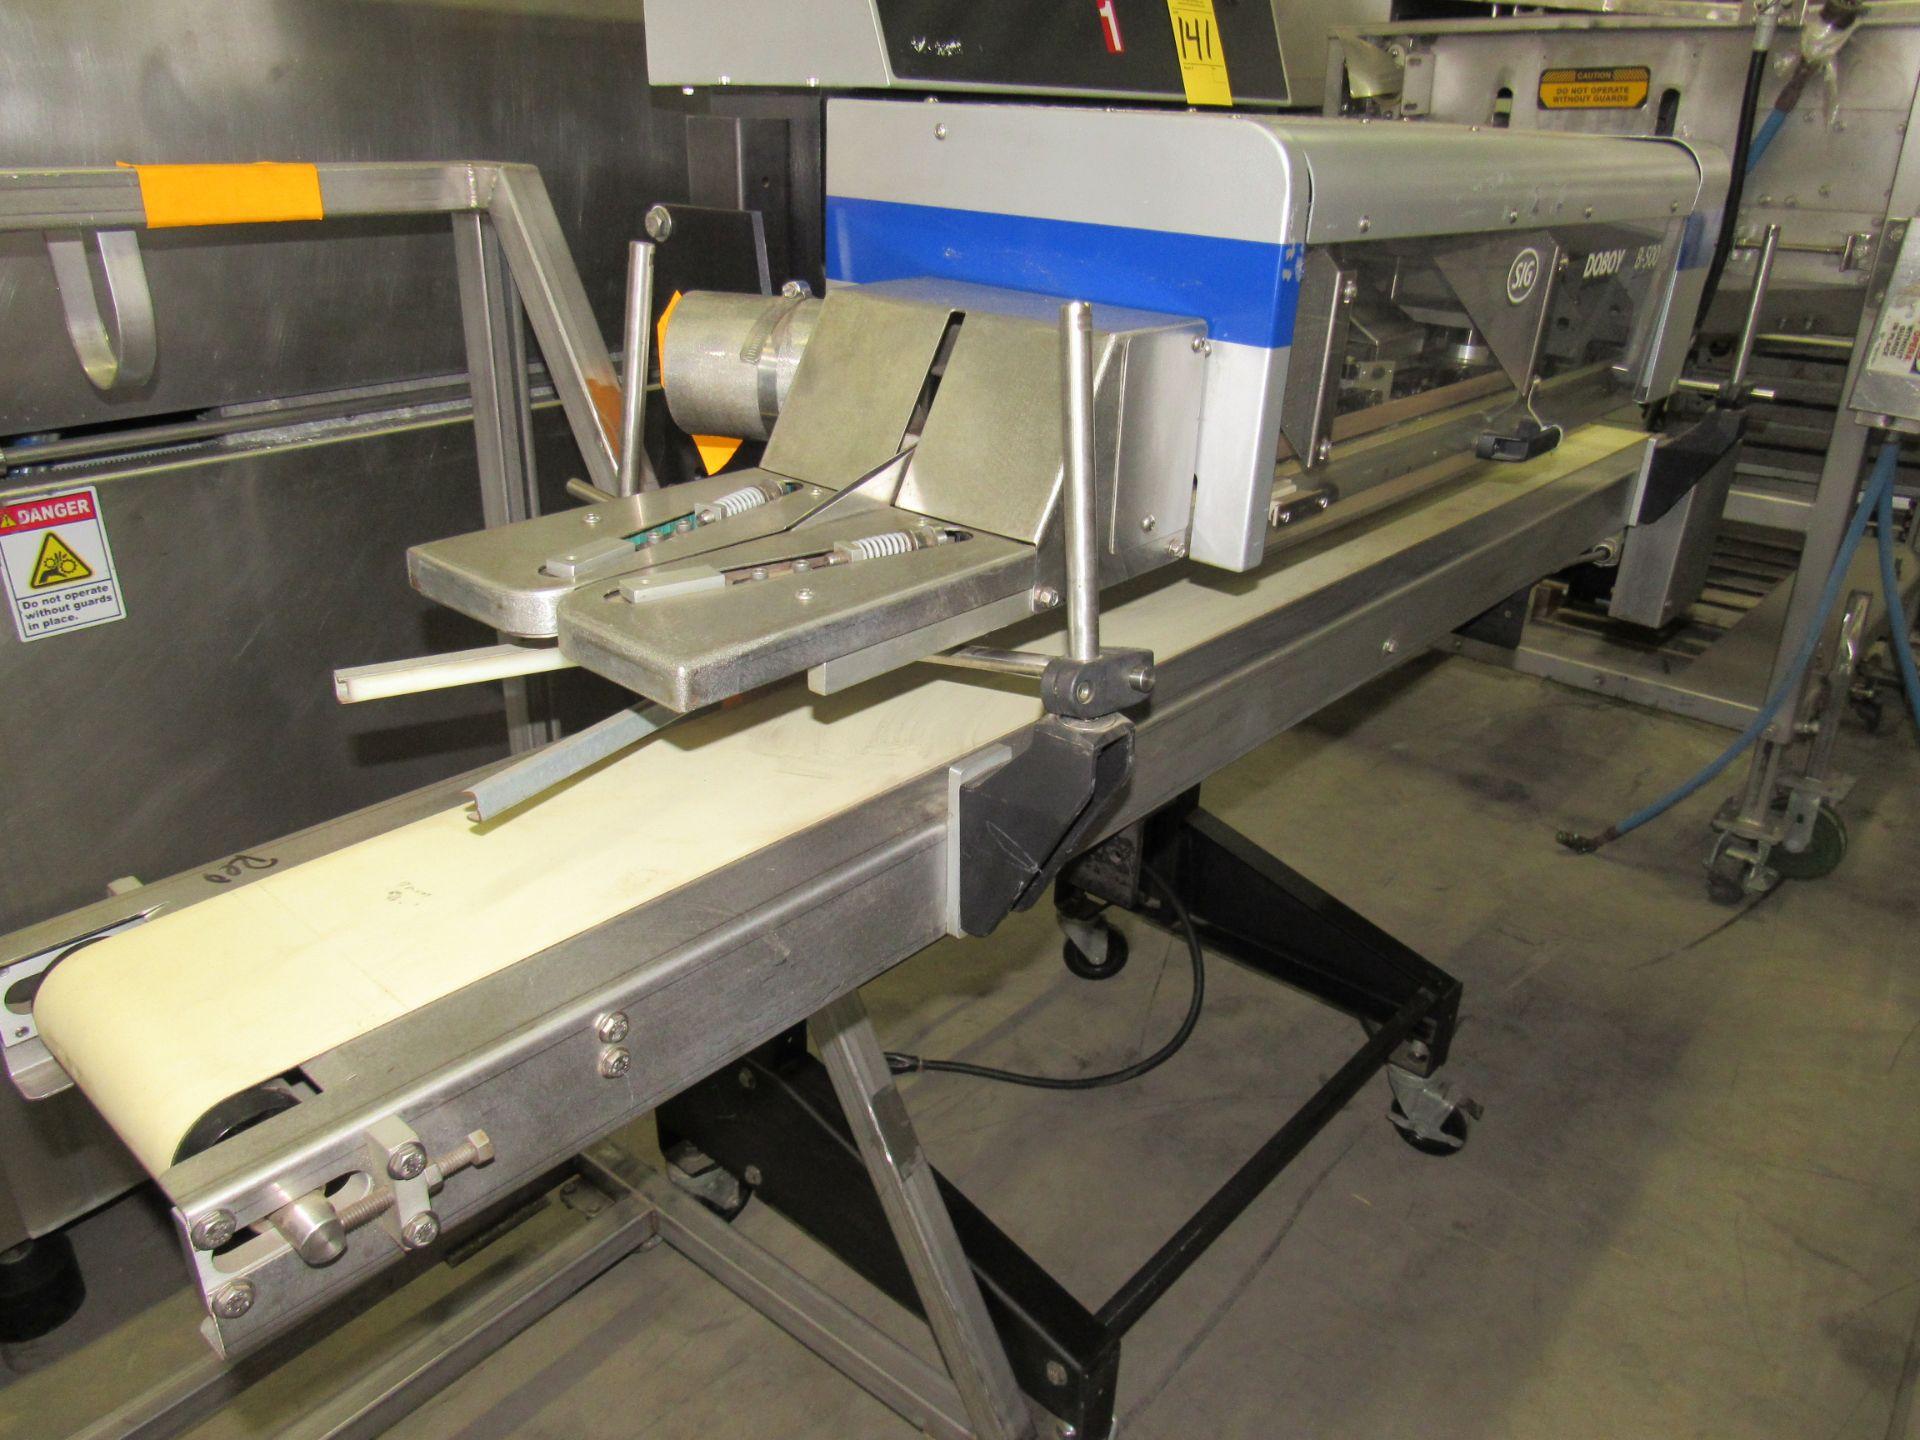 "Lot 141 - Doboy Mdl. B-500 Continuous Bag Sealer, adjustable feed conveyor, 54"" long sealer, 77"" long conveyor"